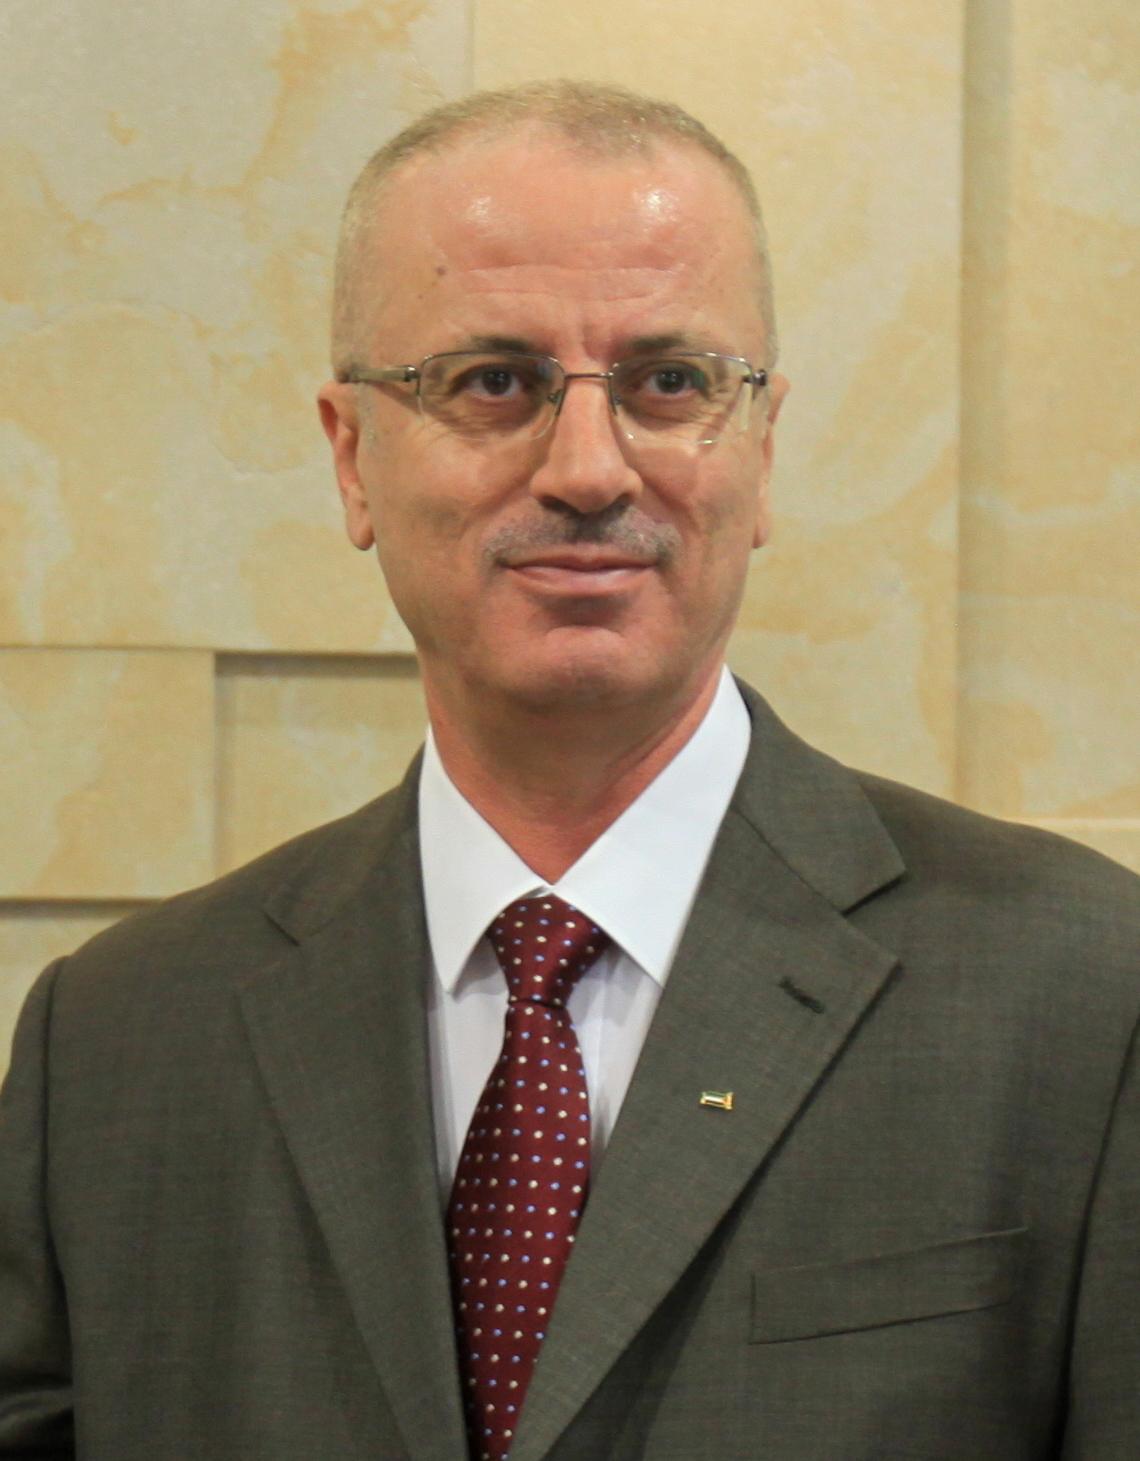 https://upload.wikimedia.org/wikipedia/commons/8/8e/Rami_Hamdallah_October_2013.jpg